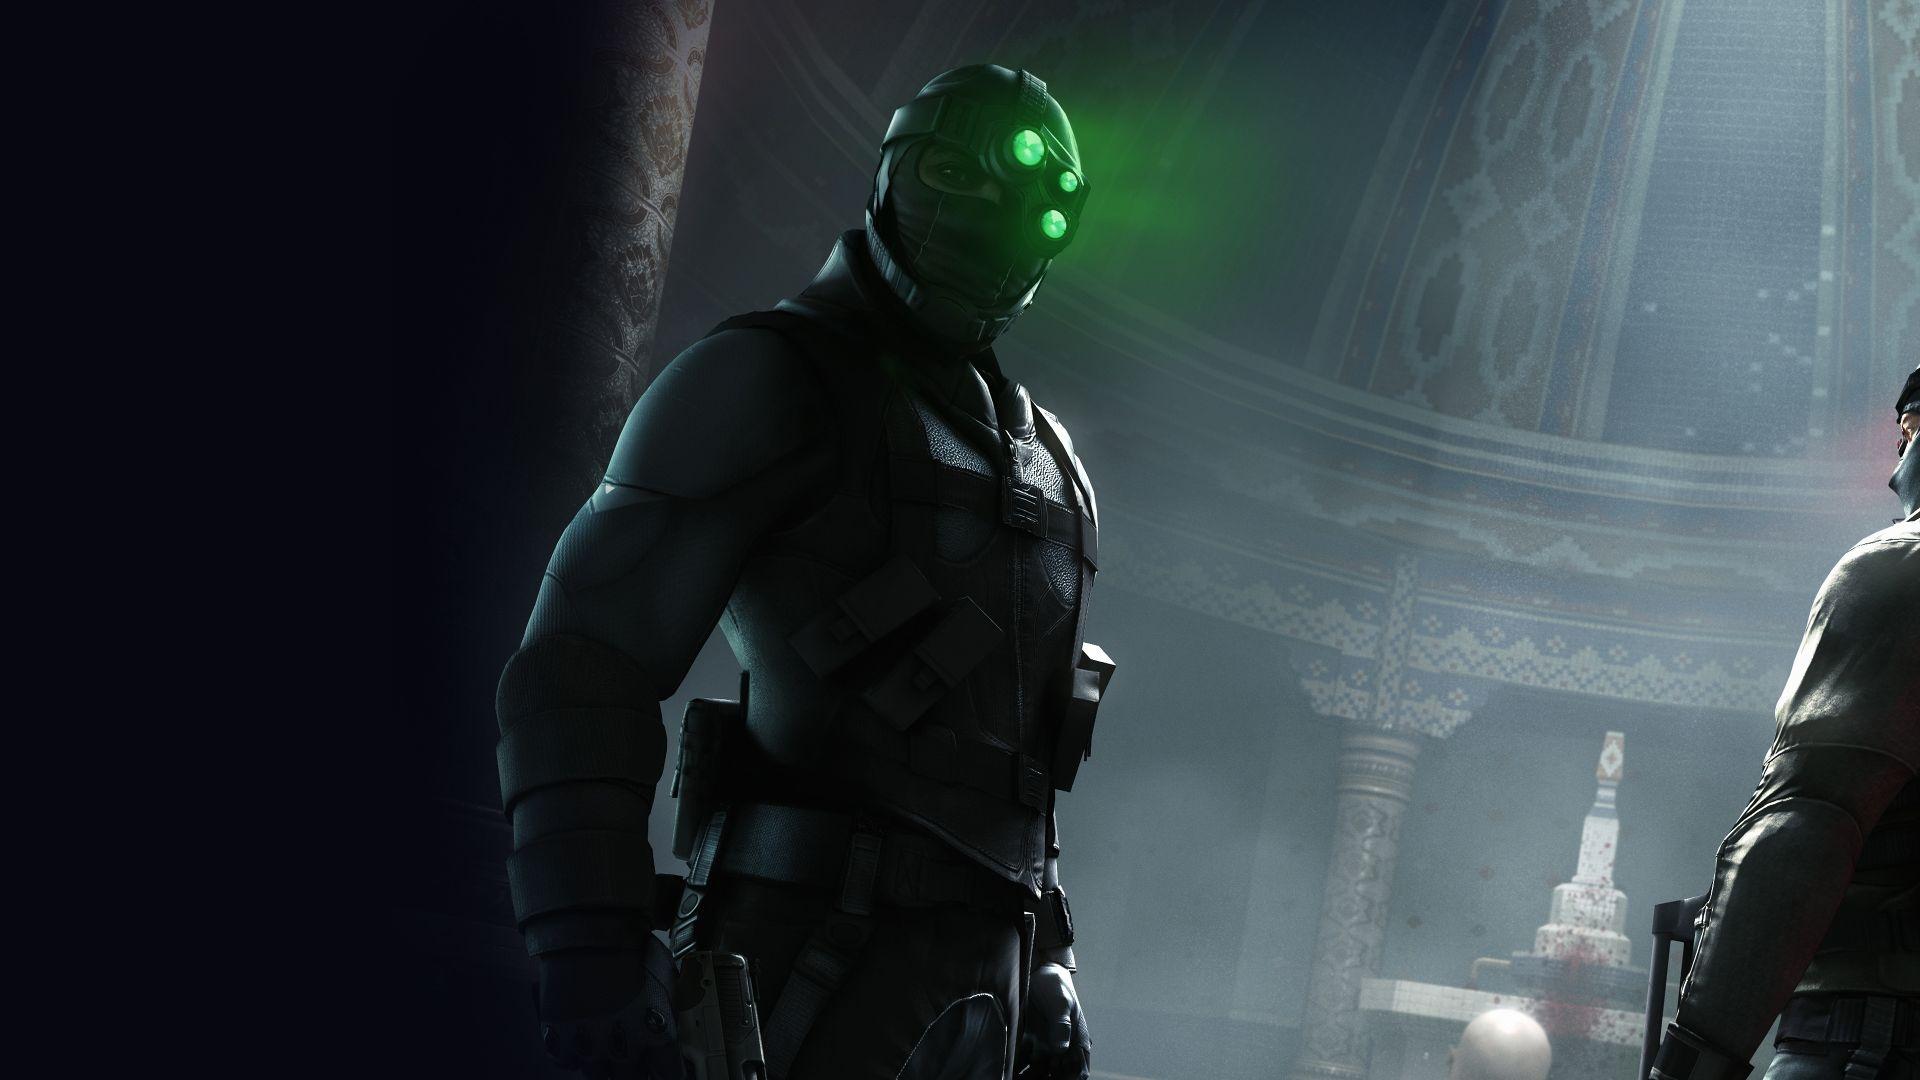 Утечка: новым оперативником Rainbow Six Siege станет кто-то из Splinter Cell